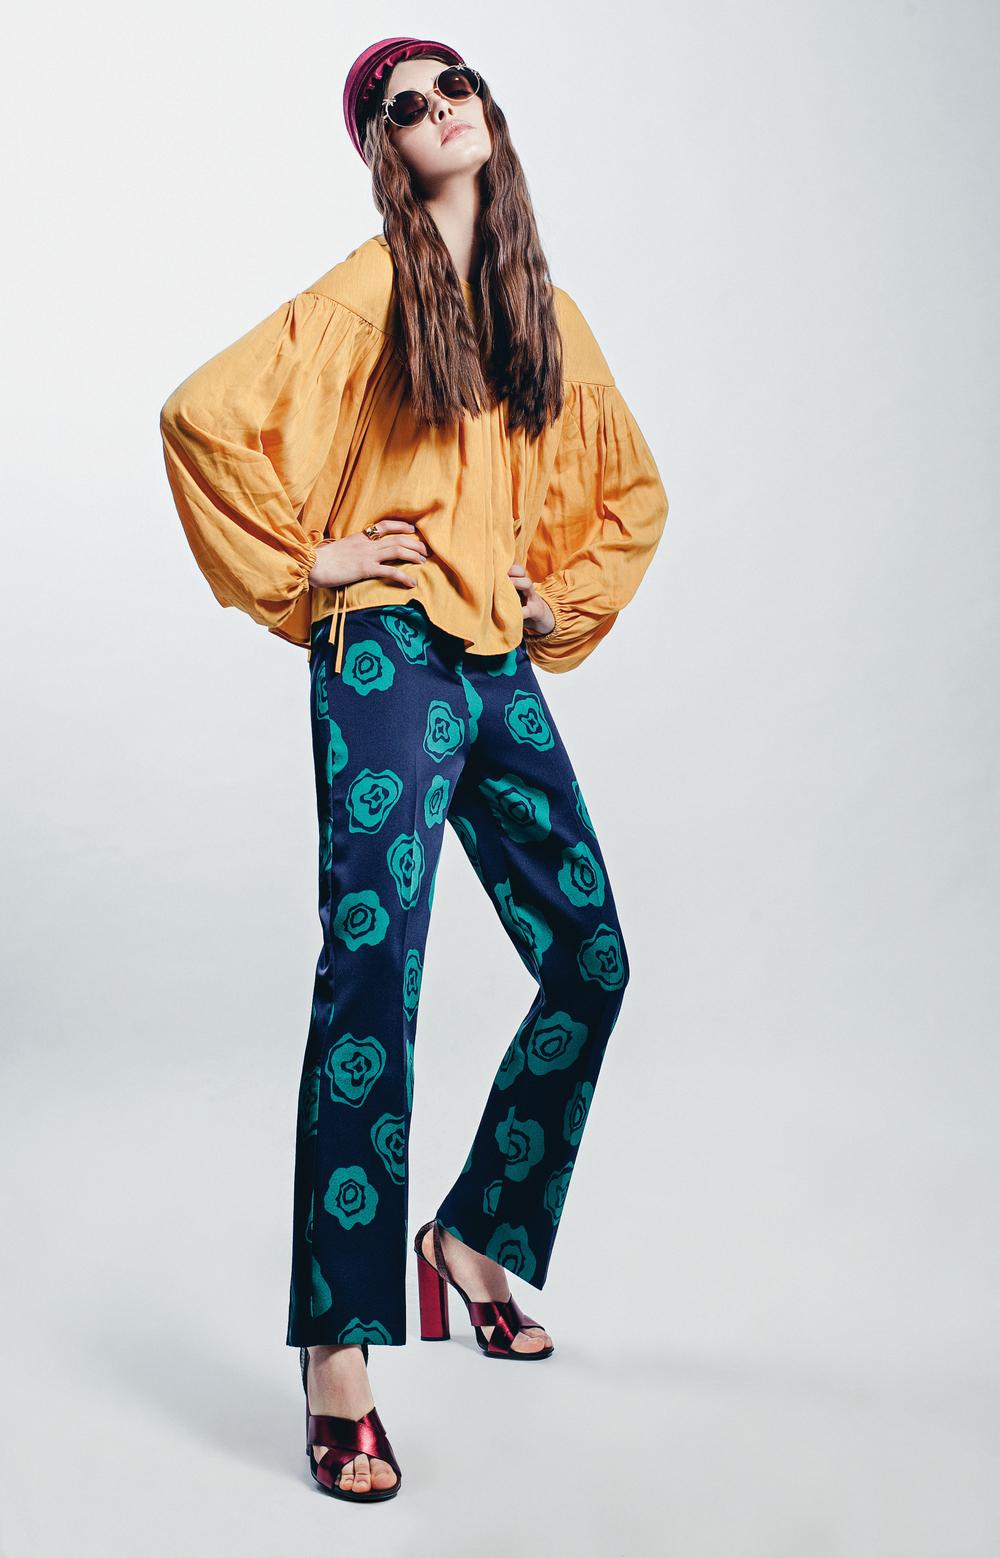 Hippie Deluxe  Top din panza, H&M, 159 lei; pantaloni din satin, H&M, 199 lei; ochelari de soare, H&M, 19,90 lei; palarie din catifea, Gabriela Dumitran, gabrieladumitran. com, pret lacerere; inel metalic, Louis Vuitton, 1.400 lei; sandale din piele lacuita, Gucci, pretla cerere.